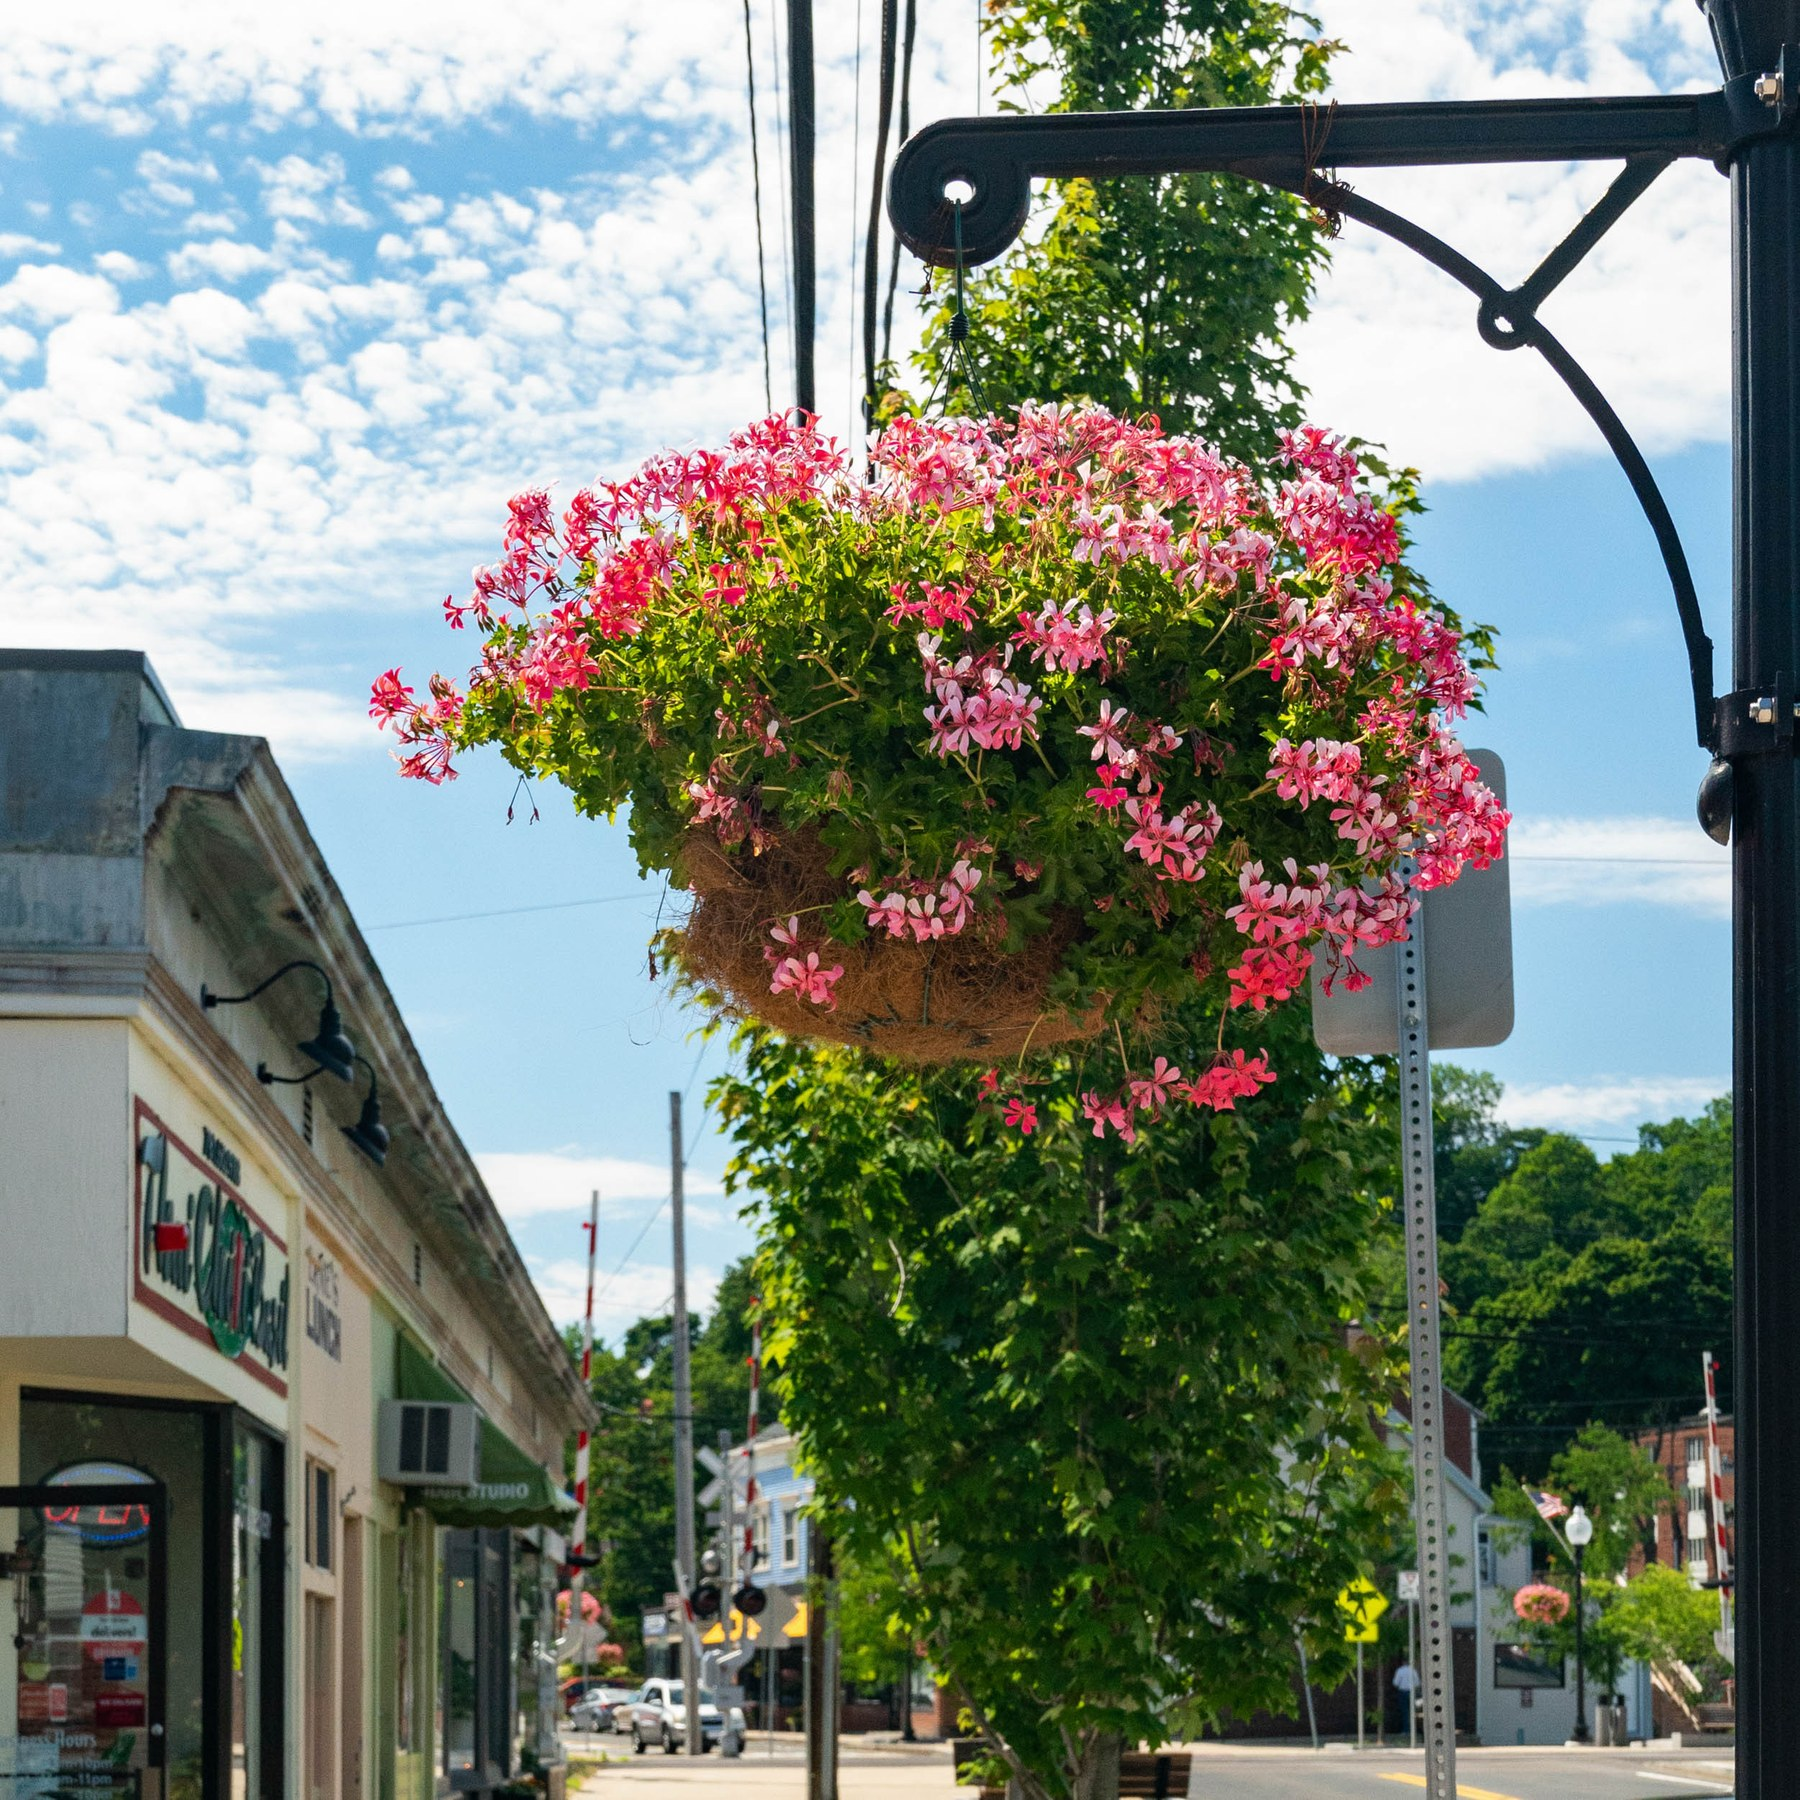 Local Com Homes For Rent: Melrose Highlands, Melrose MA - Neighborhood Guide